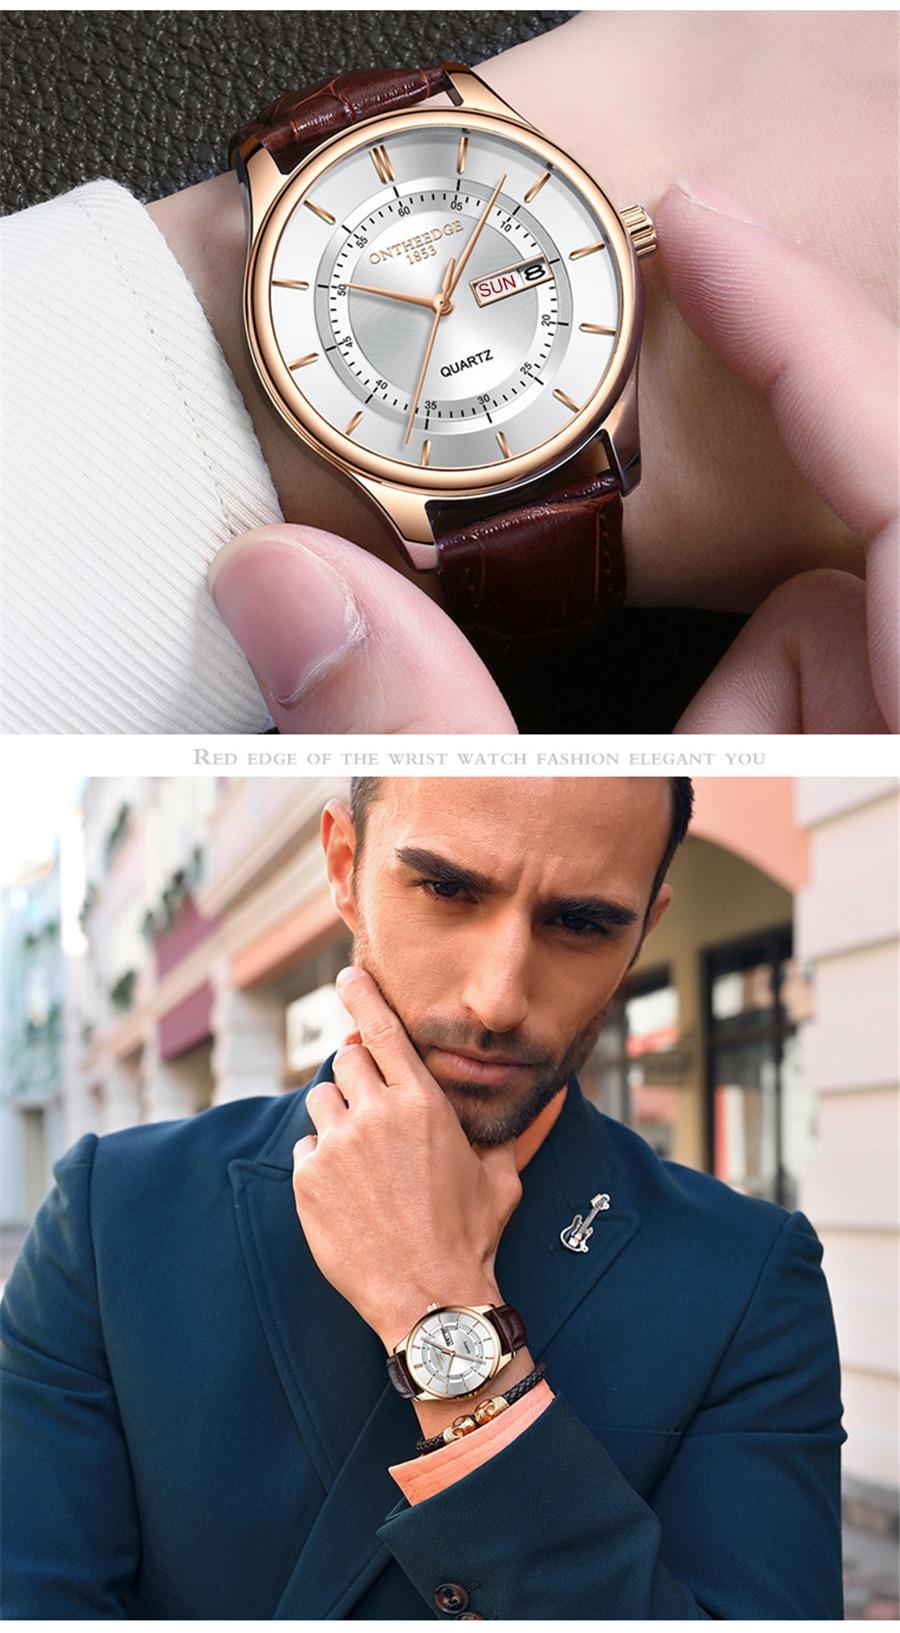 HTB1c7c.iFGWBuNjy0Fbq6z4sXXam High Quality Rose Gold Dial Watch Men Leather Waterproof 30M Watches Business Fashion Japan Quartz Movement Auto Date Male Clock